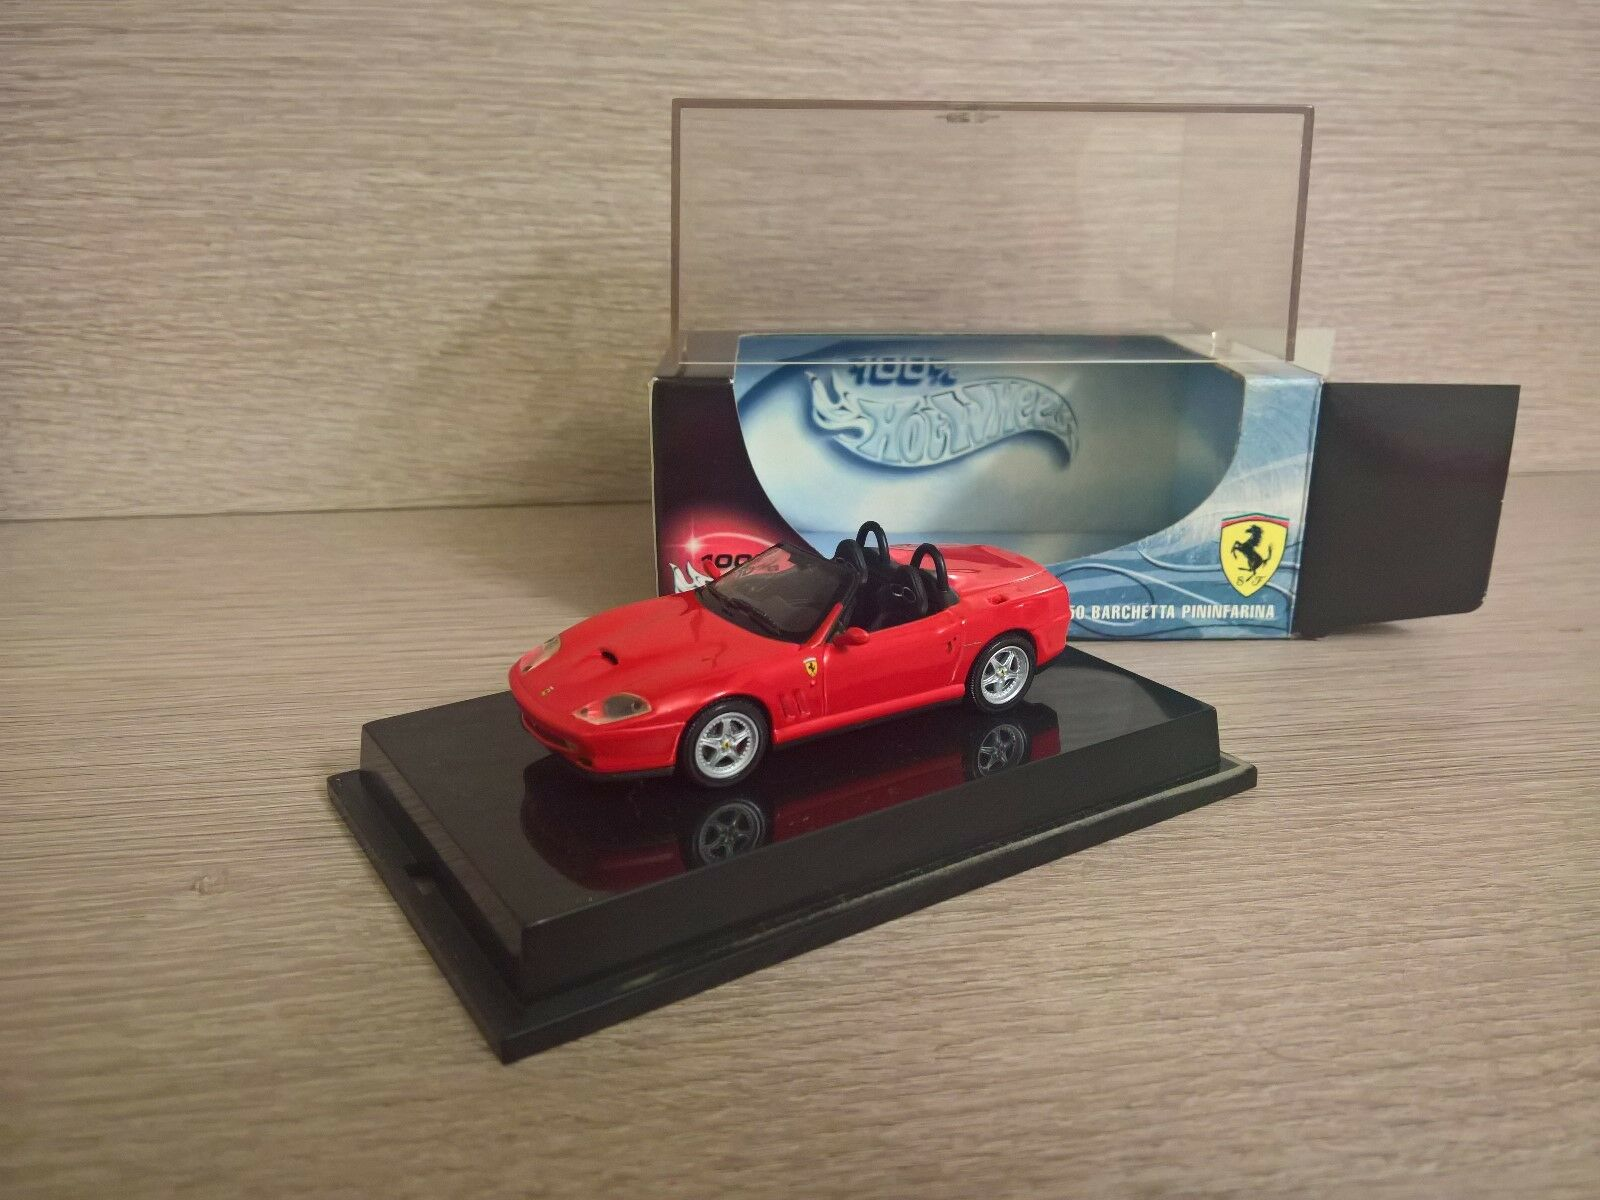 Ferrari f550 barchetta 2000 scala scala scala 1 43 rosso   ROT hot wheels 04b956